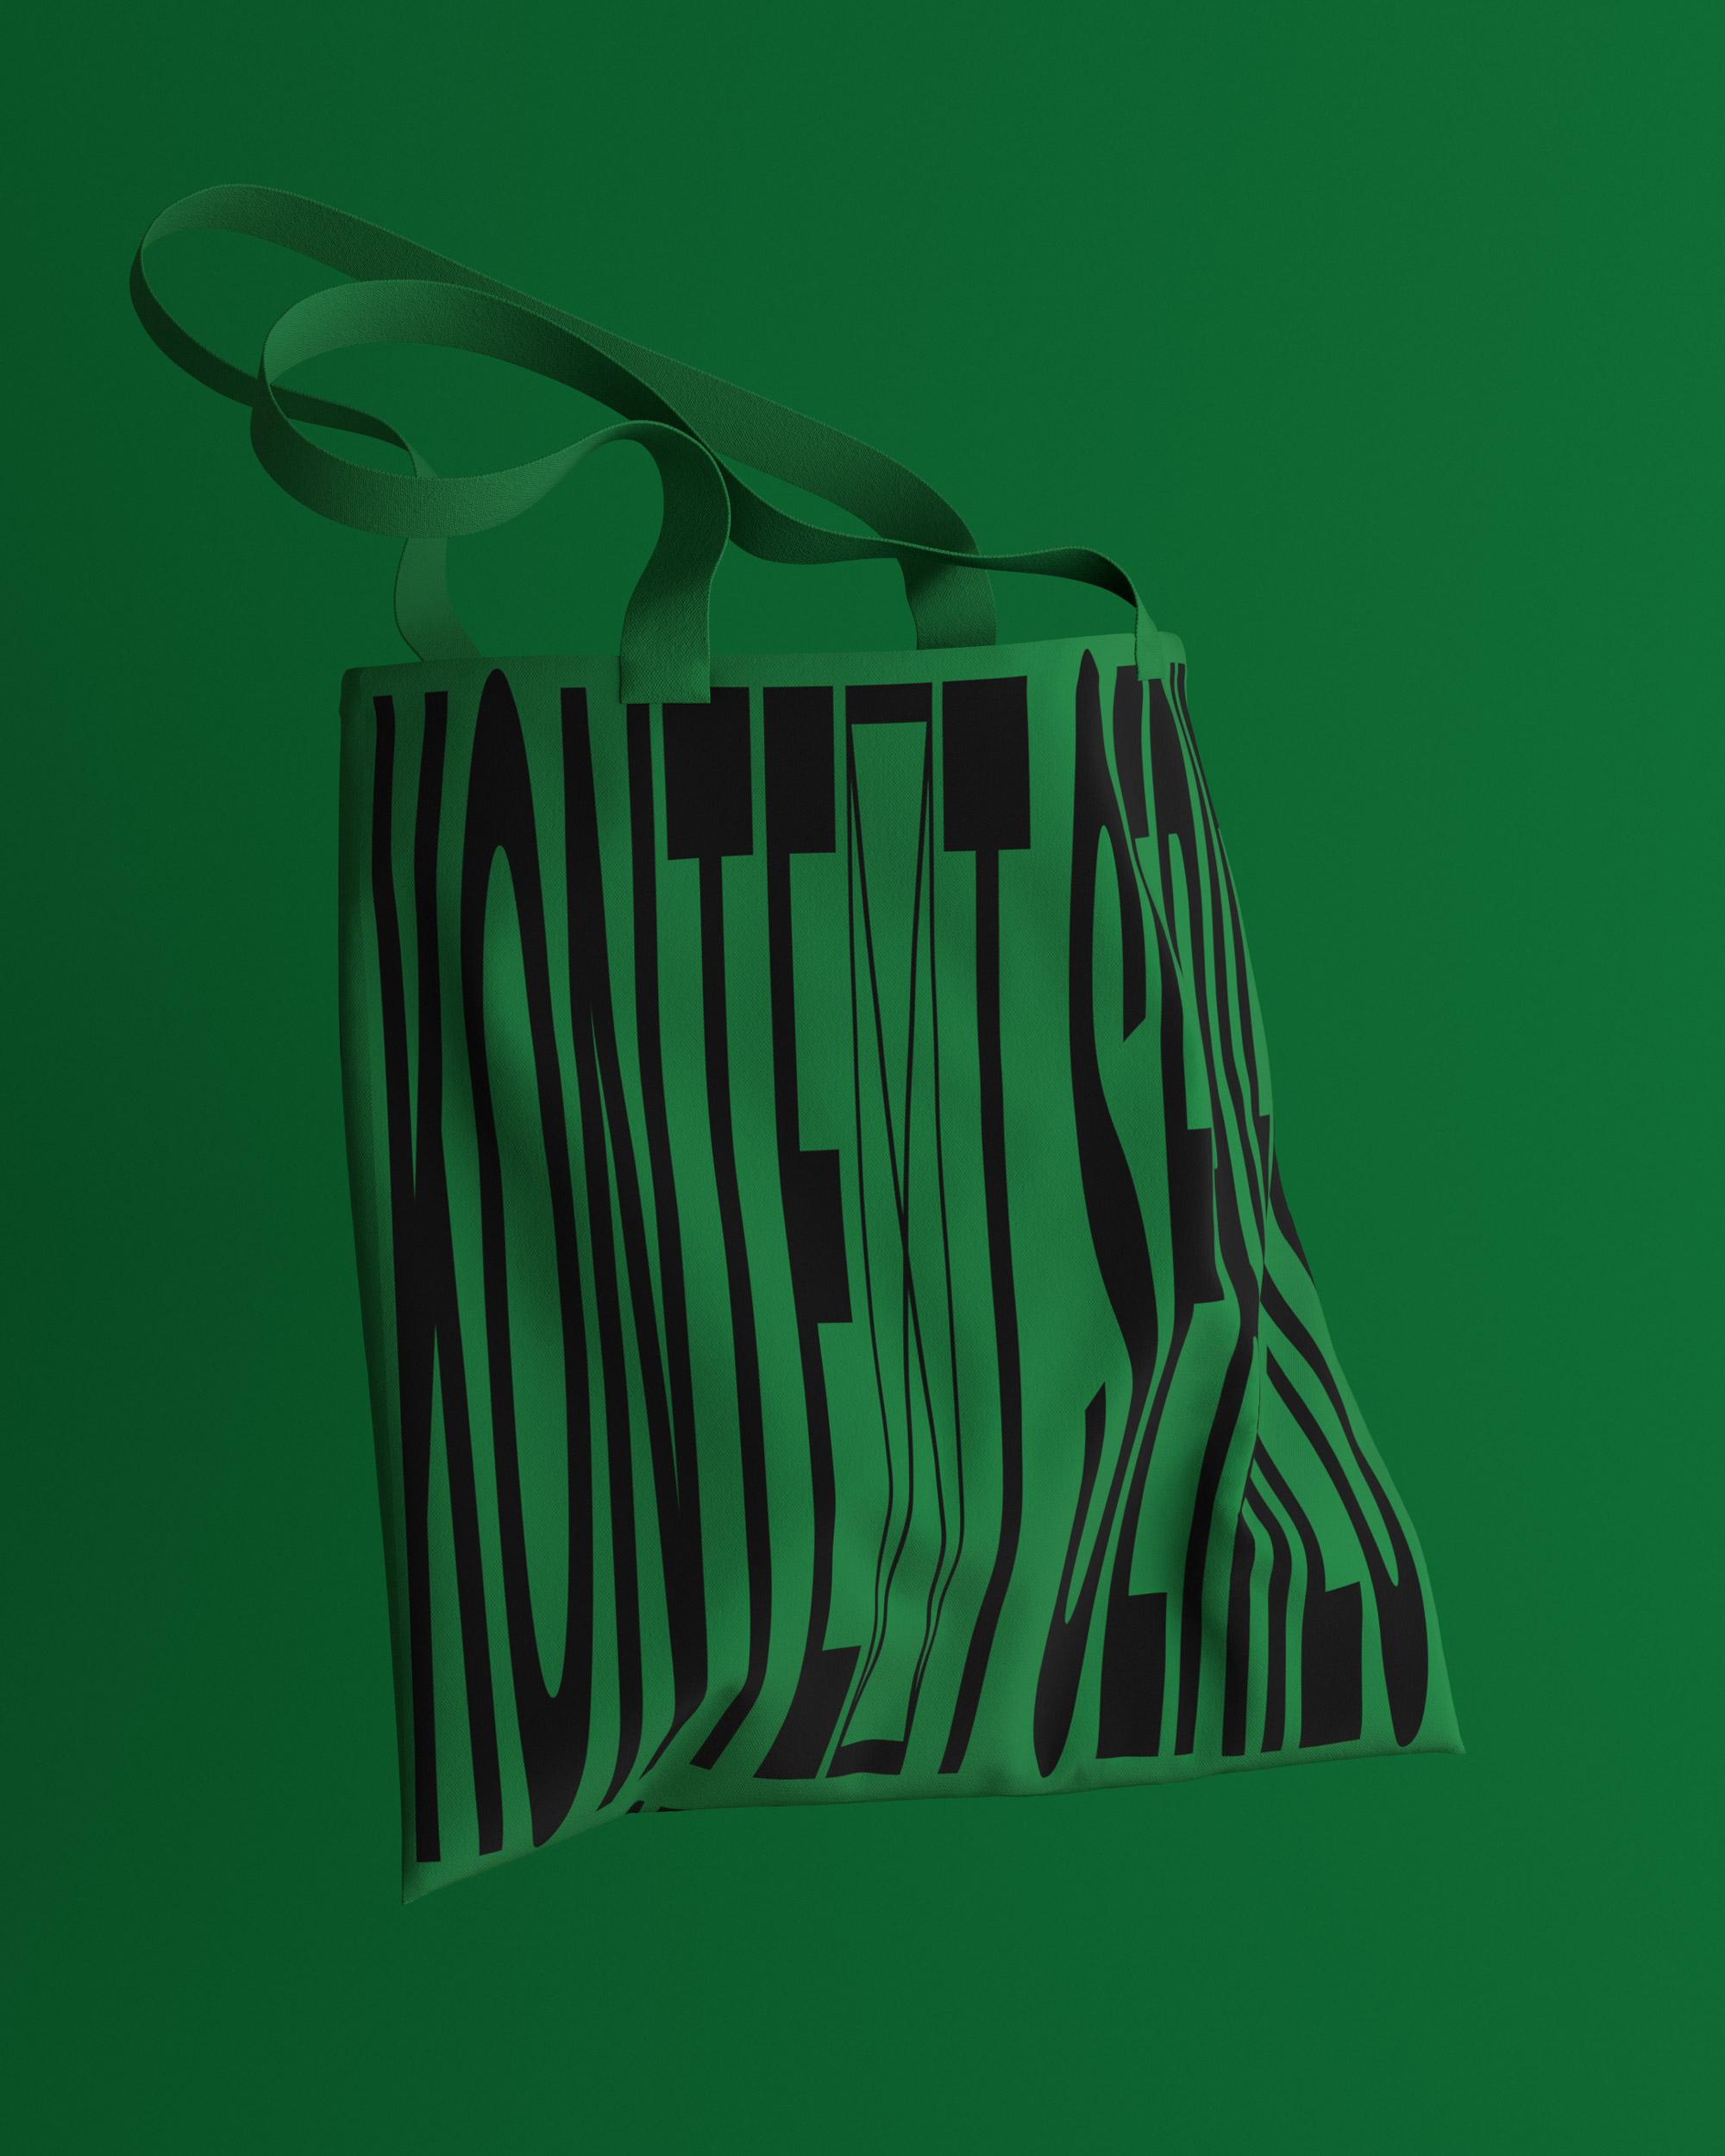 Kontext - Tote Bag Mockup